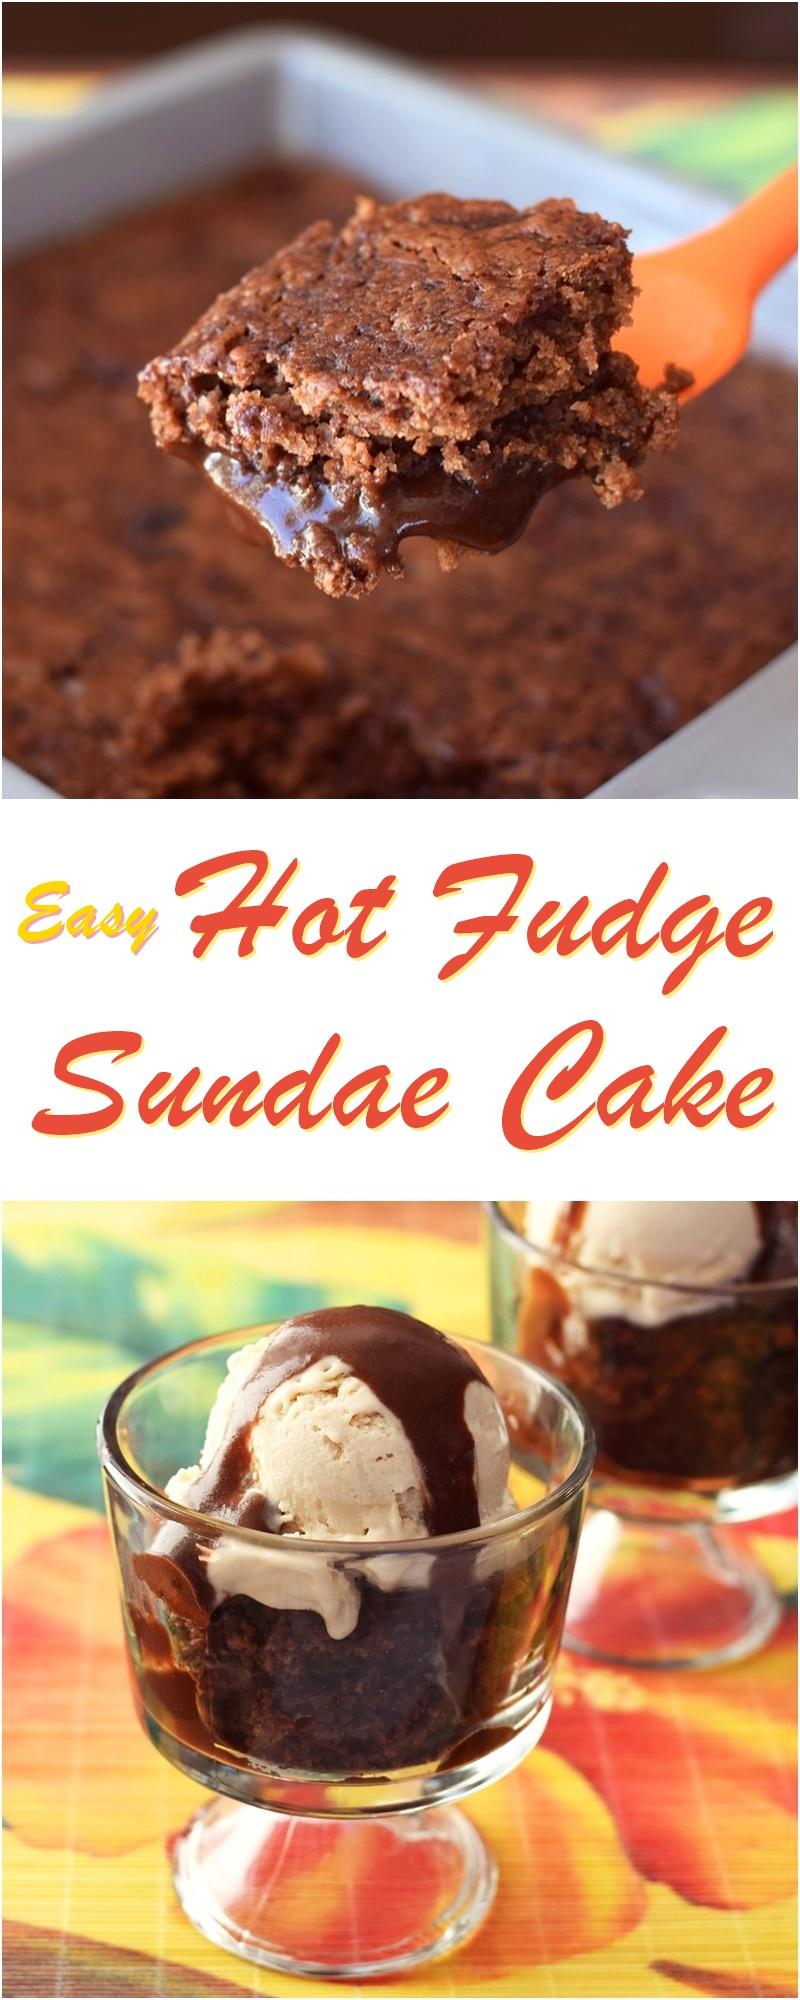 Hot Fudge Sundae Cake Recipe - Easy Dairy-Free Dessert with a cake top and magical gooey bottom